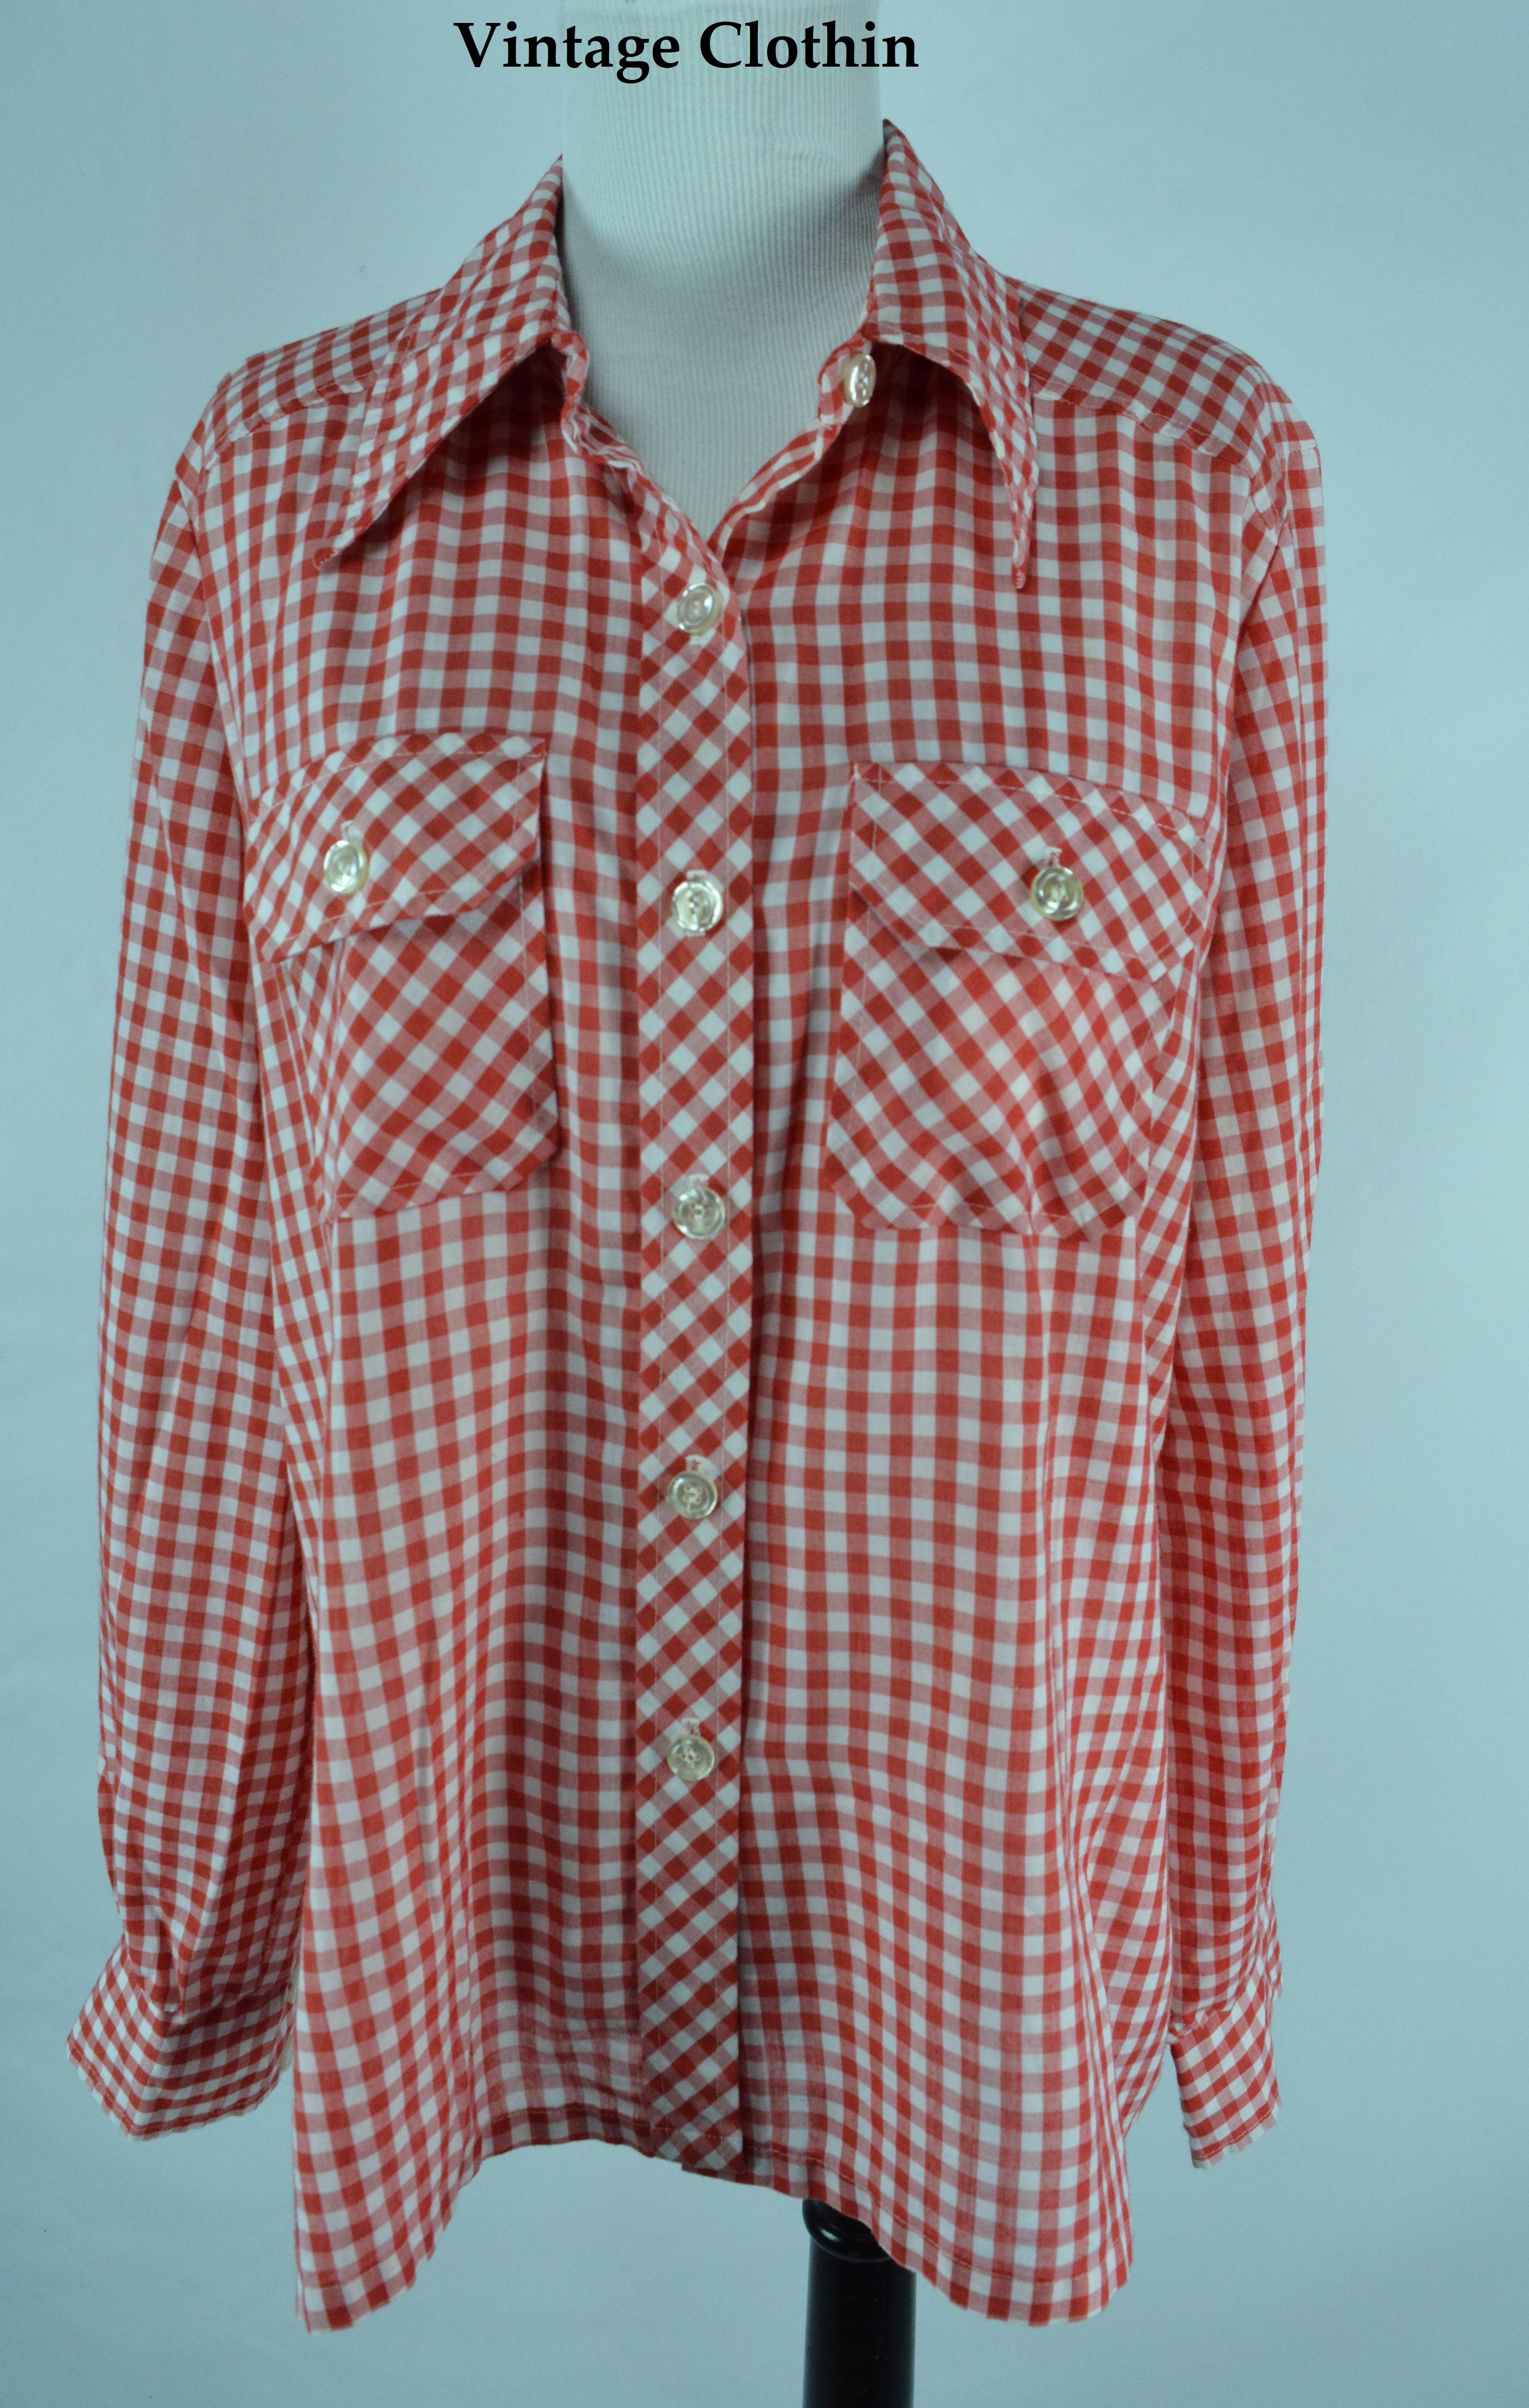 Women's Vintage Clothing & Accessories – Vintage Apparel ...